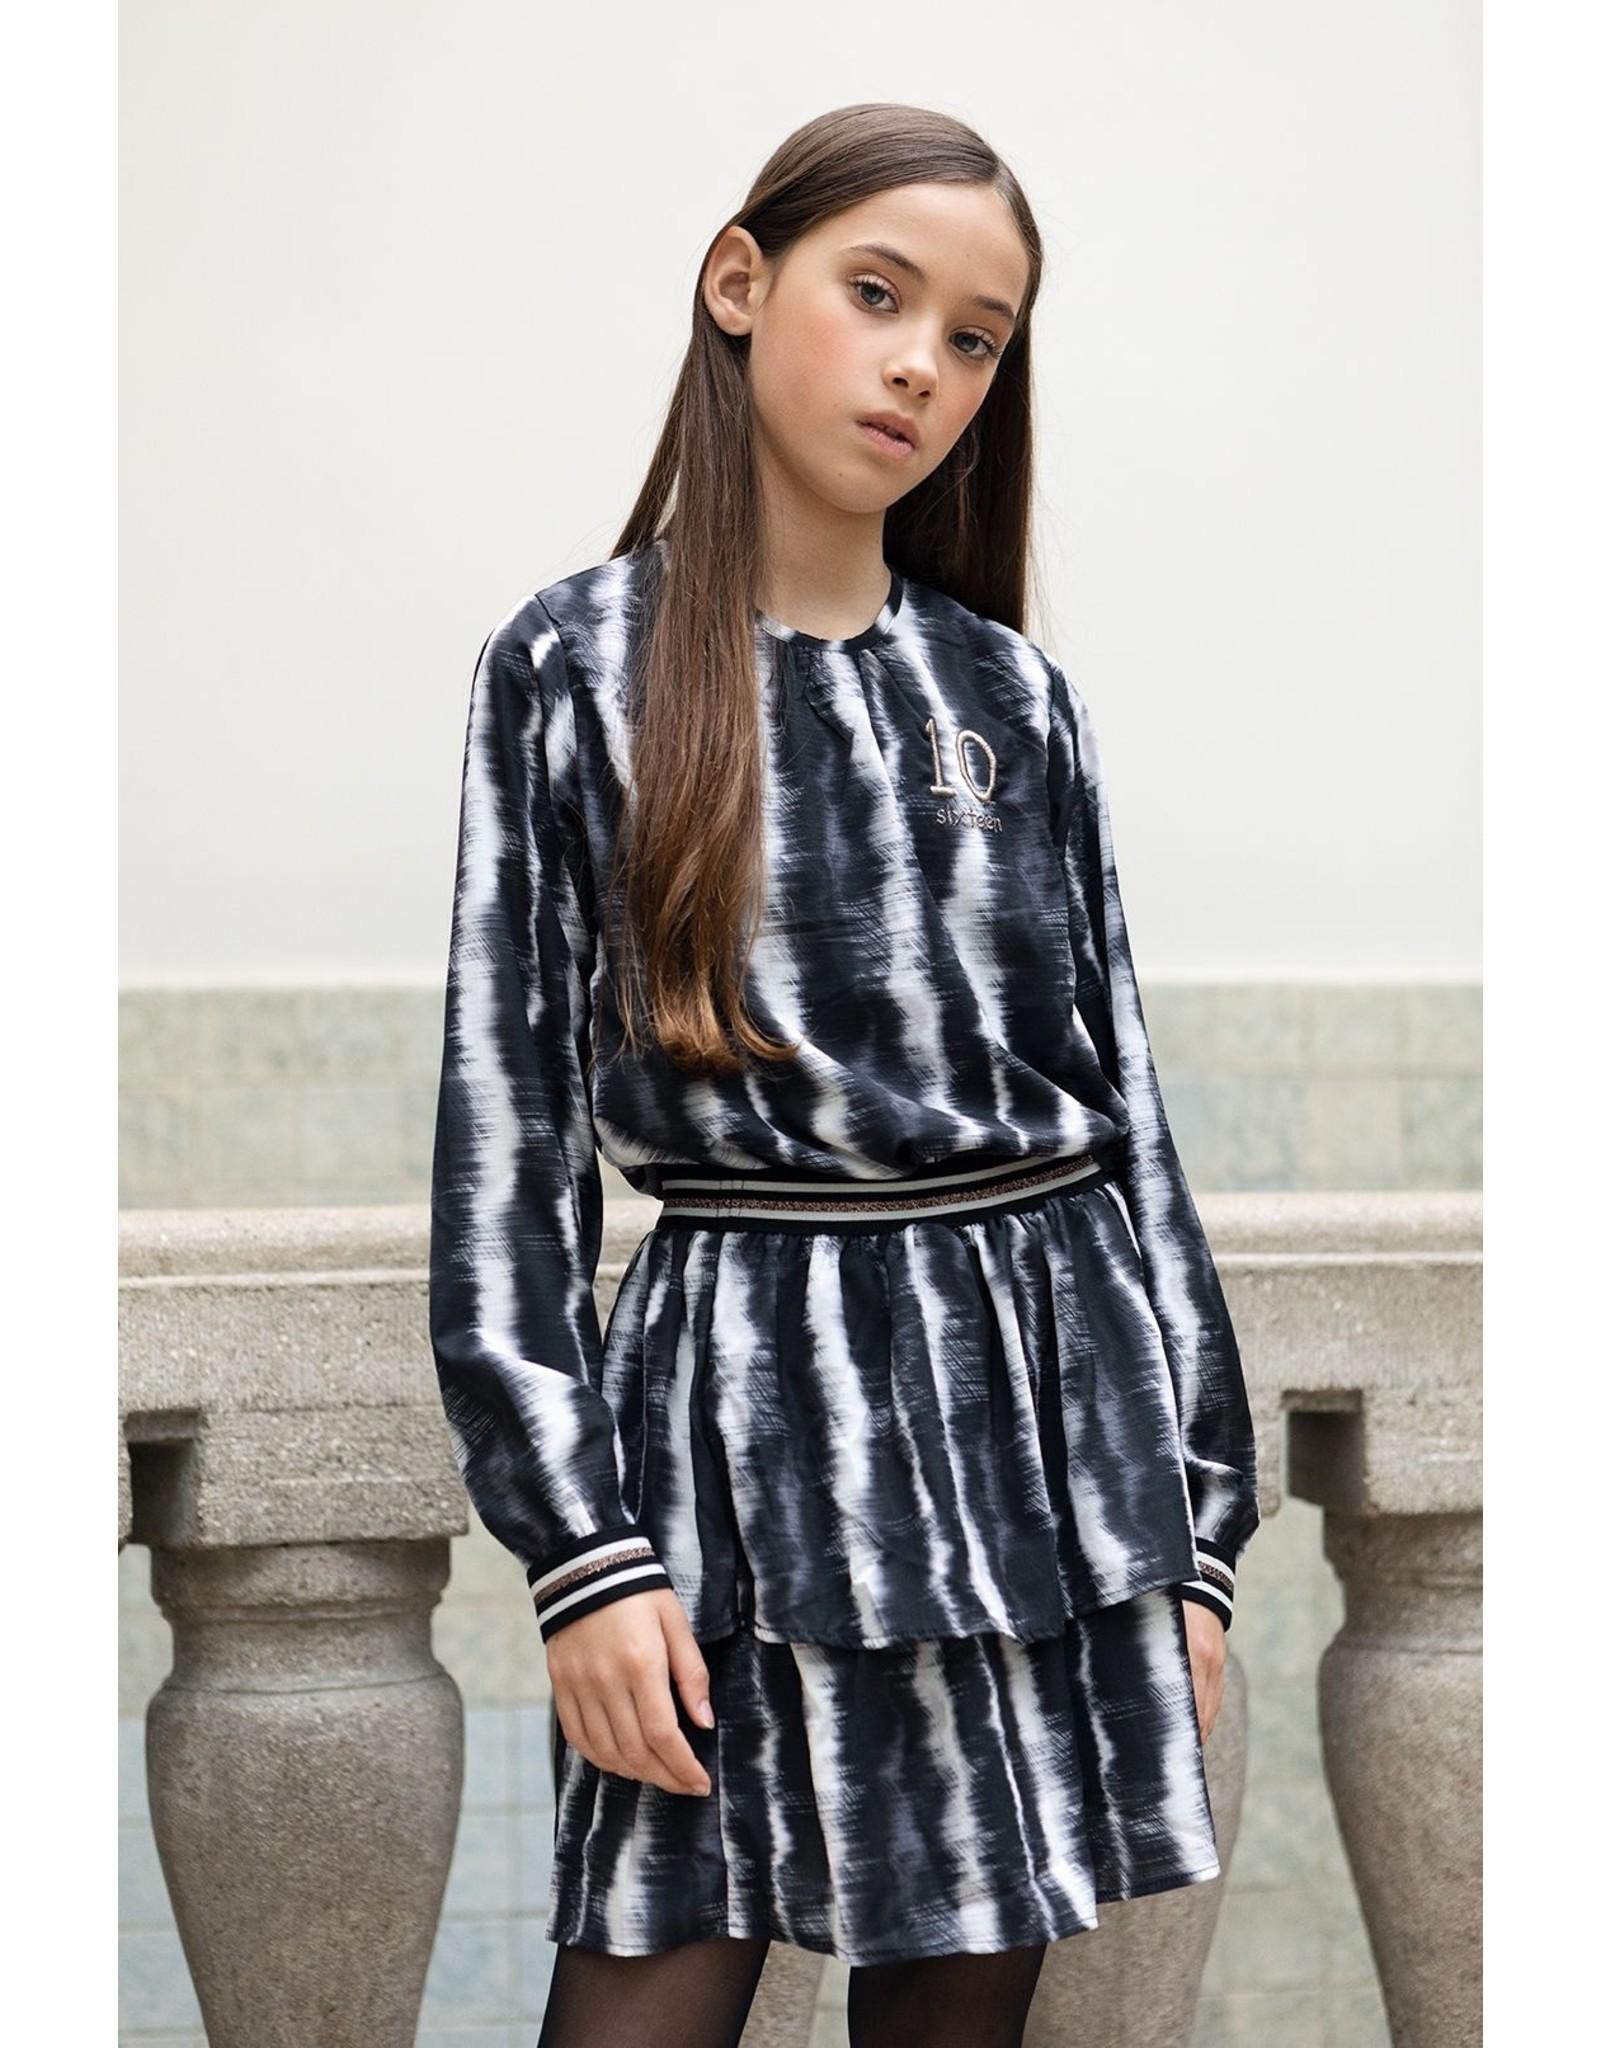 Looxs 10SIXTEEN 10Sixteen chiffon dress1